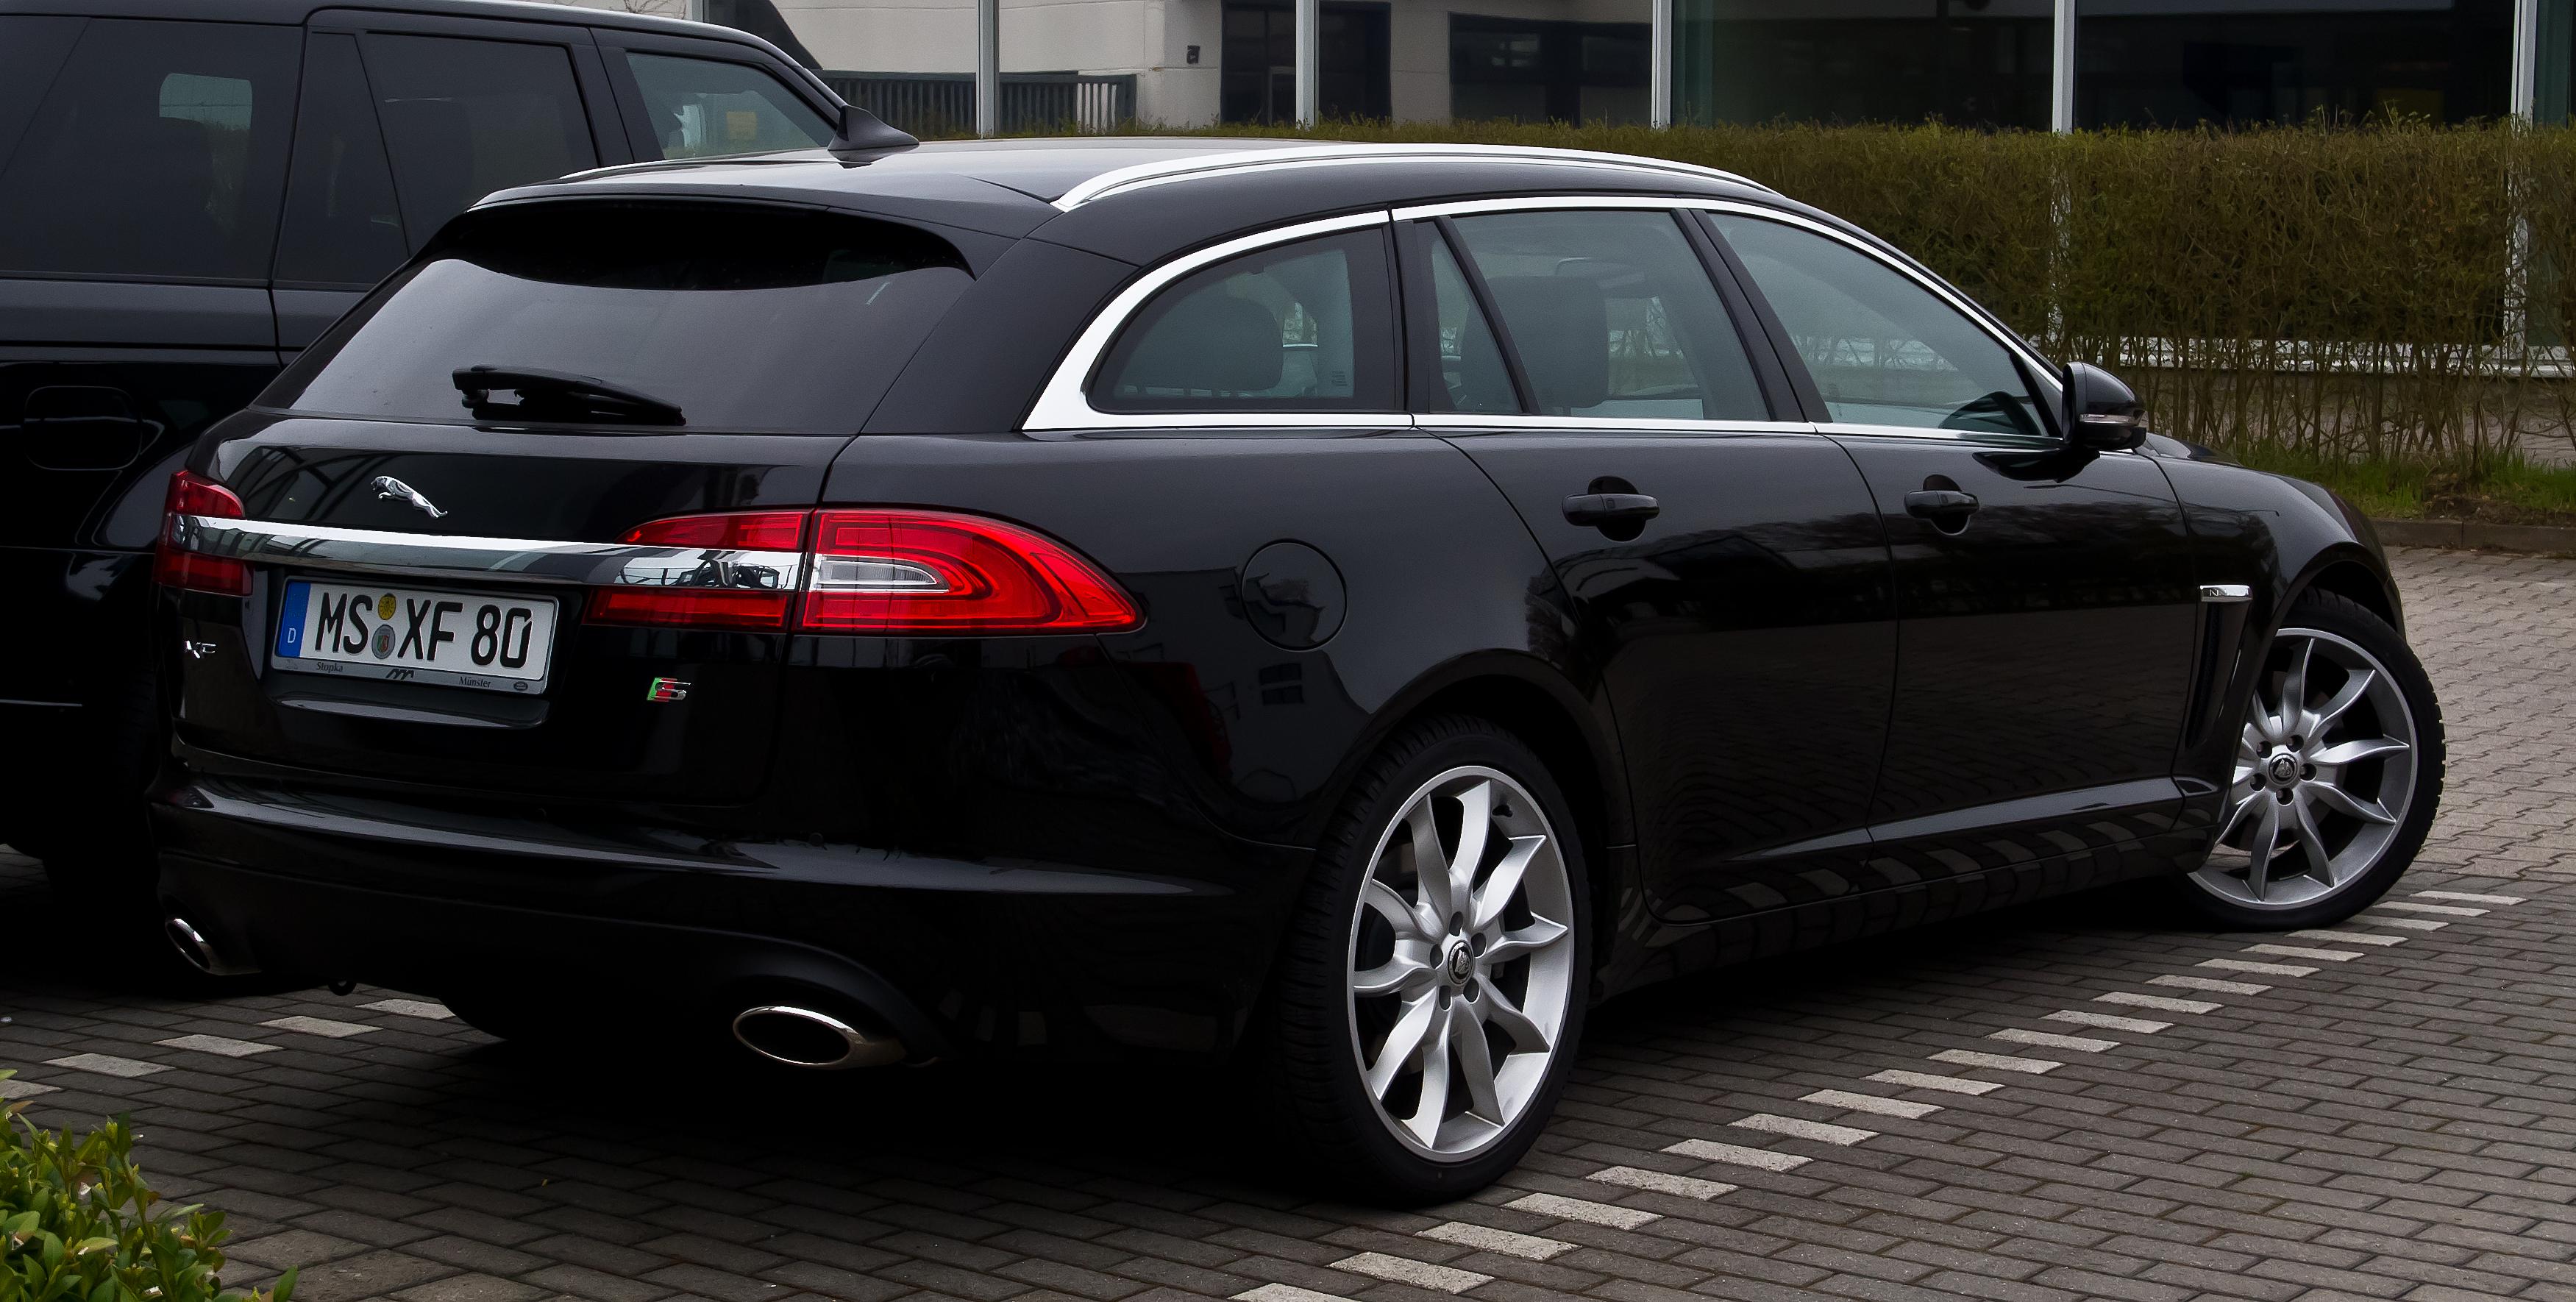 full xf used listings jaguar